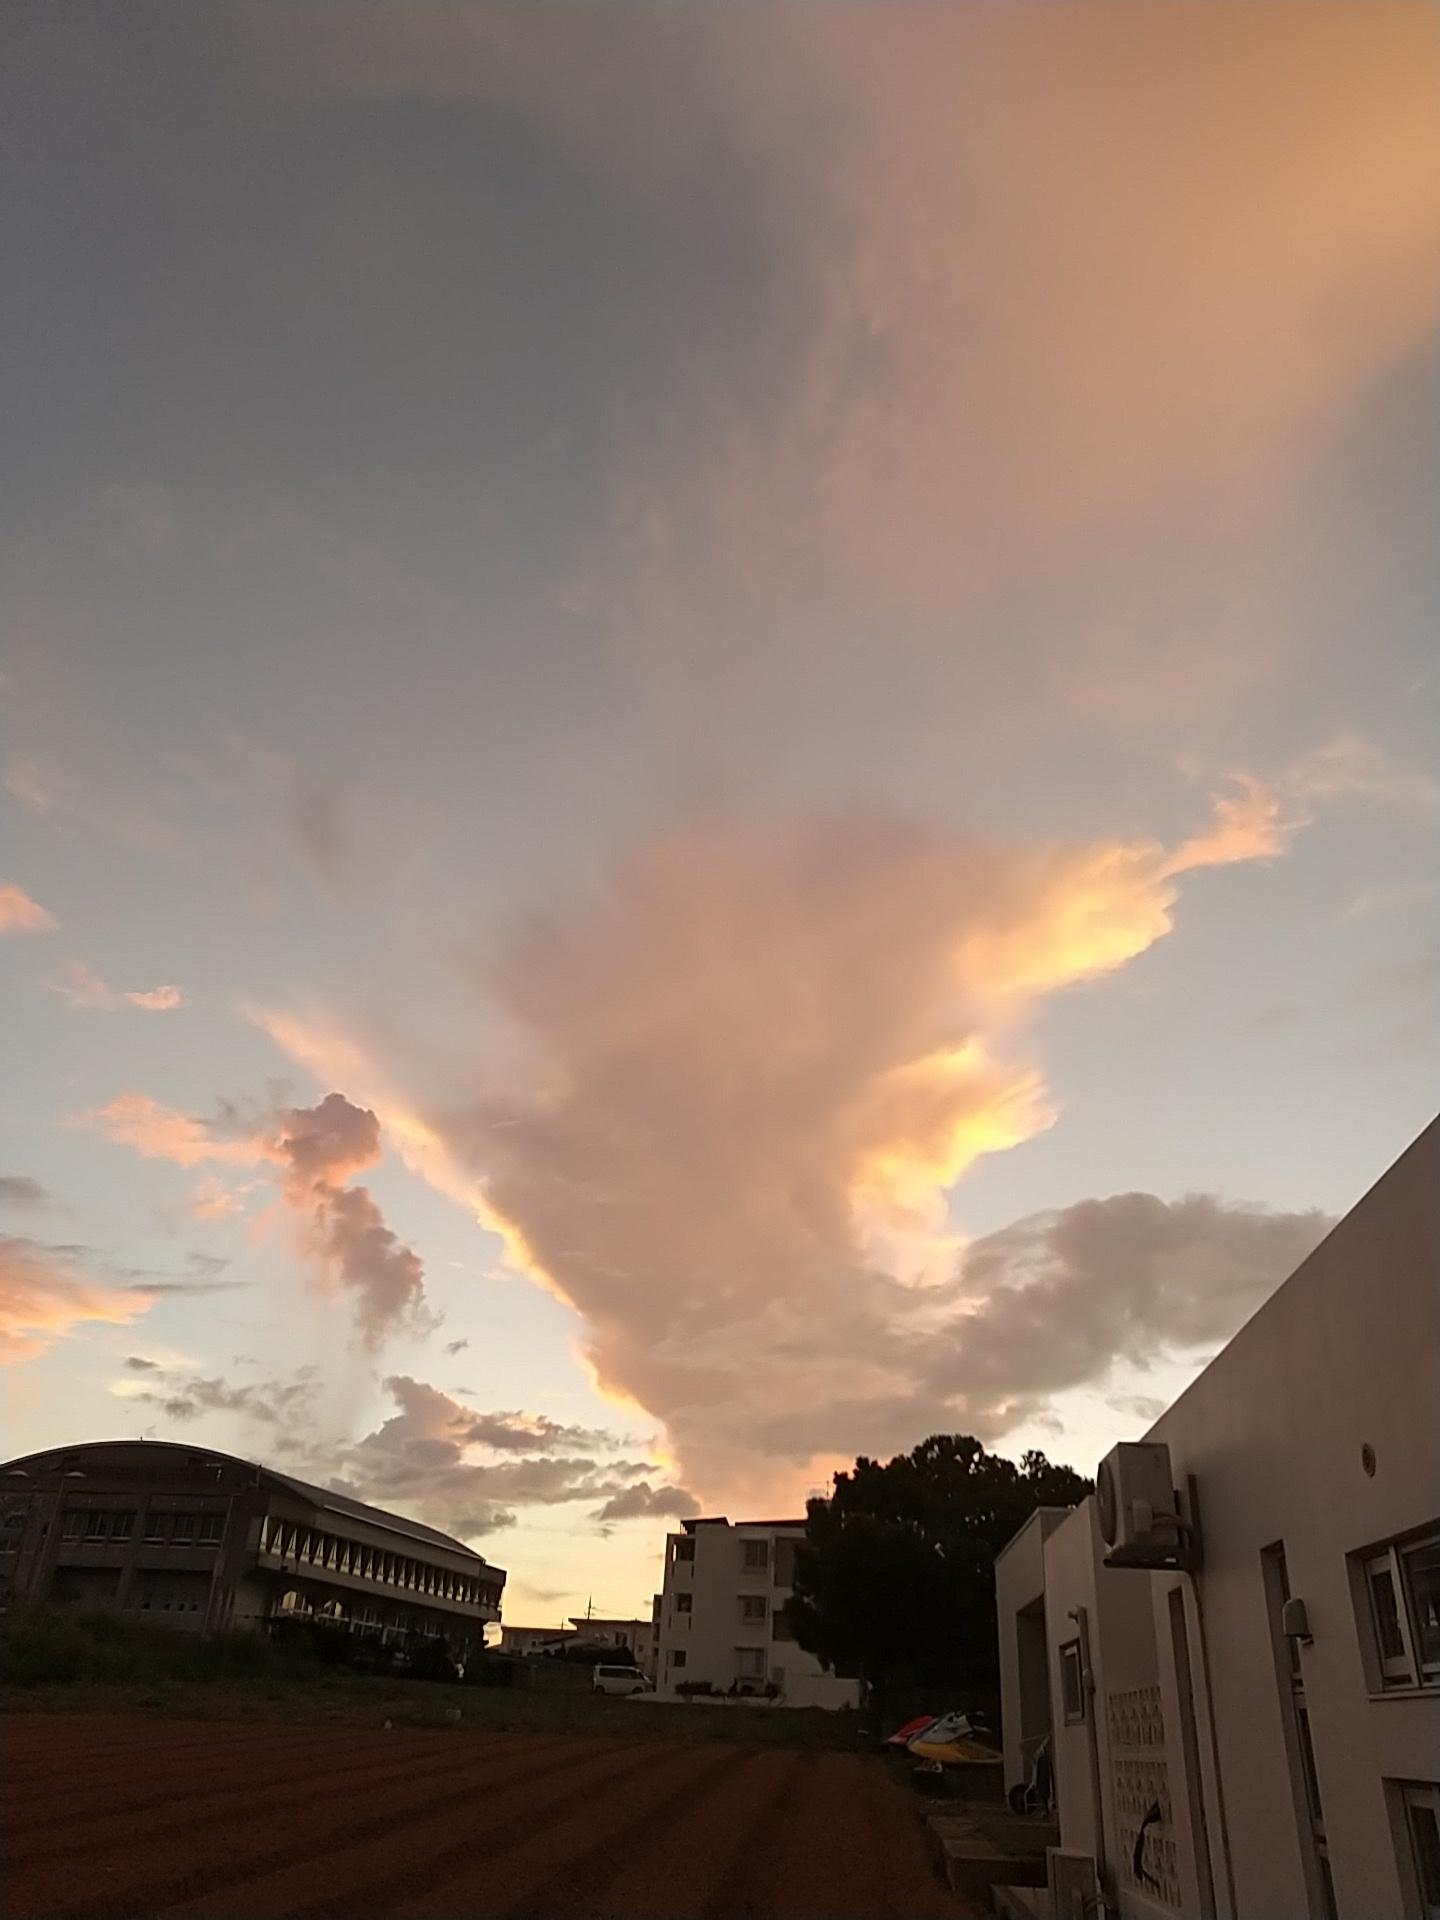 雲。虹。夕陽。夕焼け。_e0251855_19490868.jpg